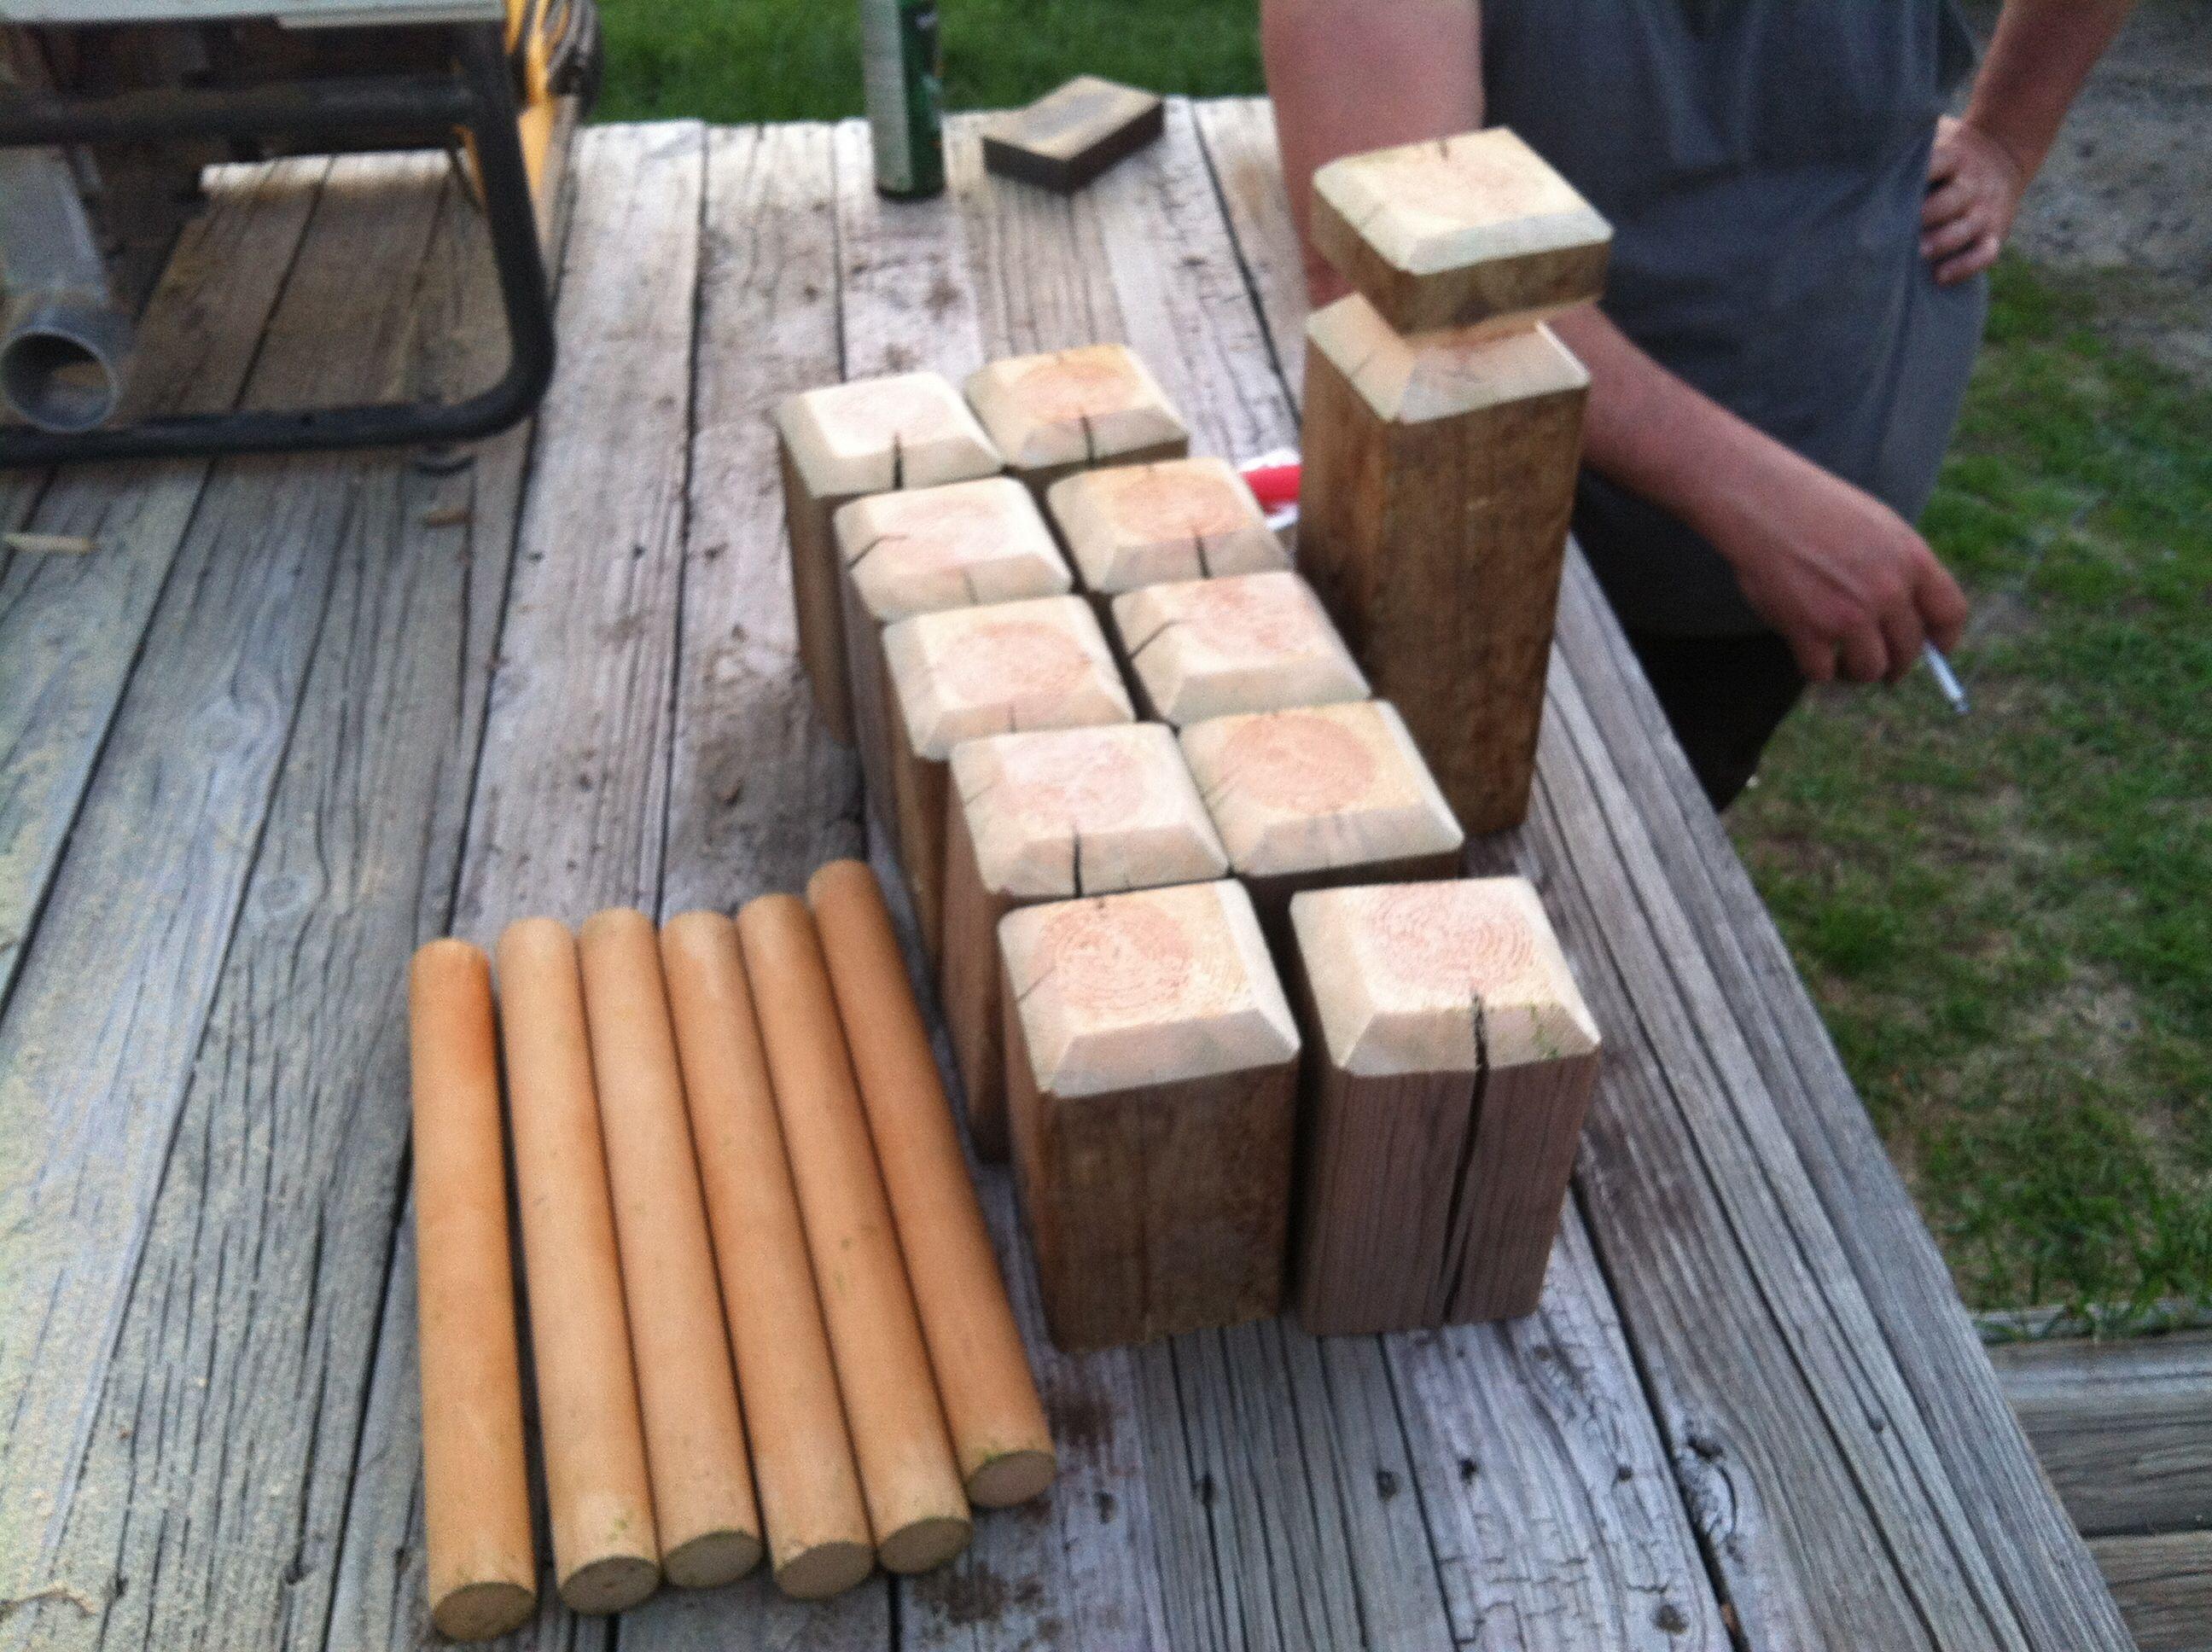 4x4 Wood Crafts Diy Kubbviking Chess Set 1 6ft 4x4 1 6ft Dowel Rod 2 Diameter